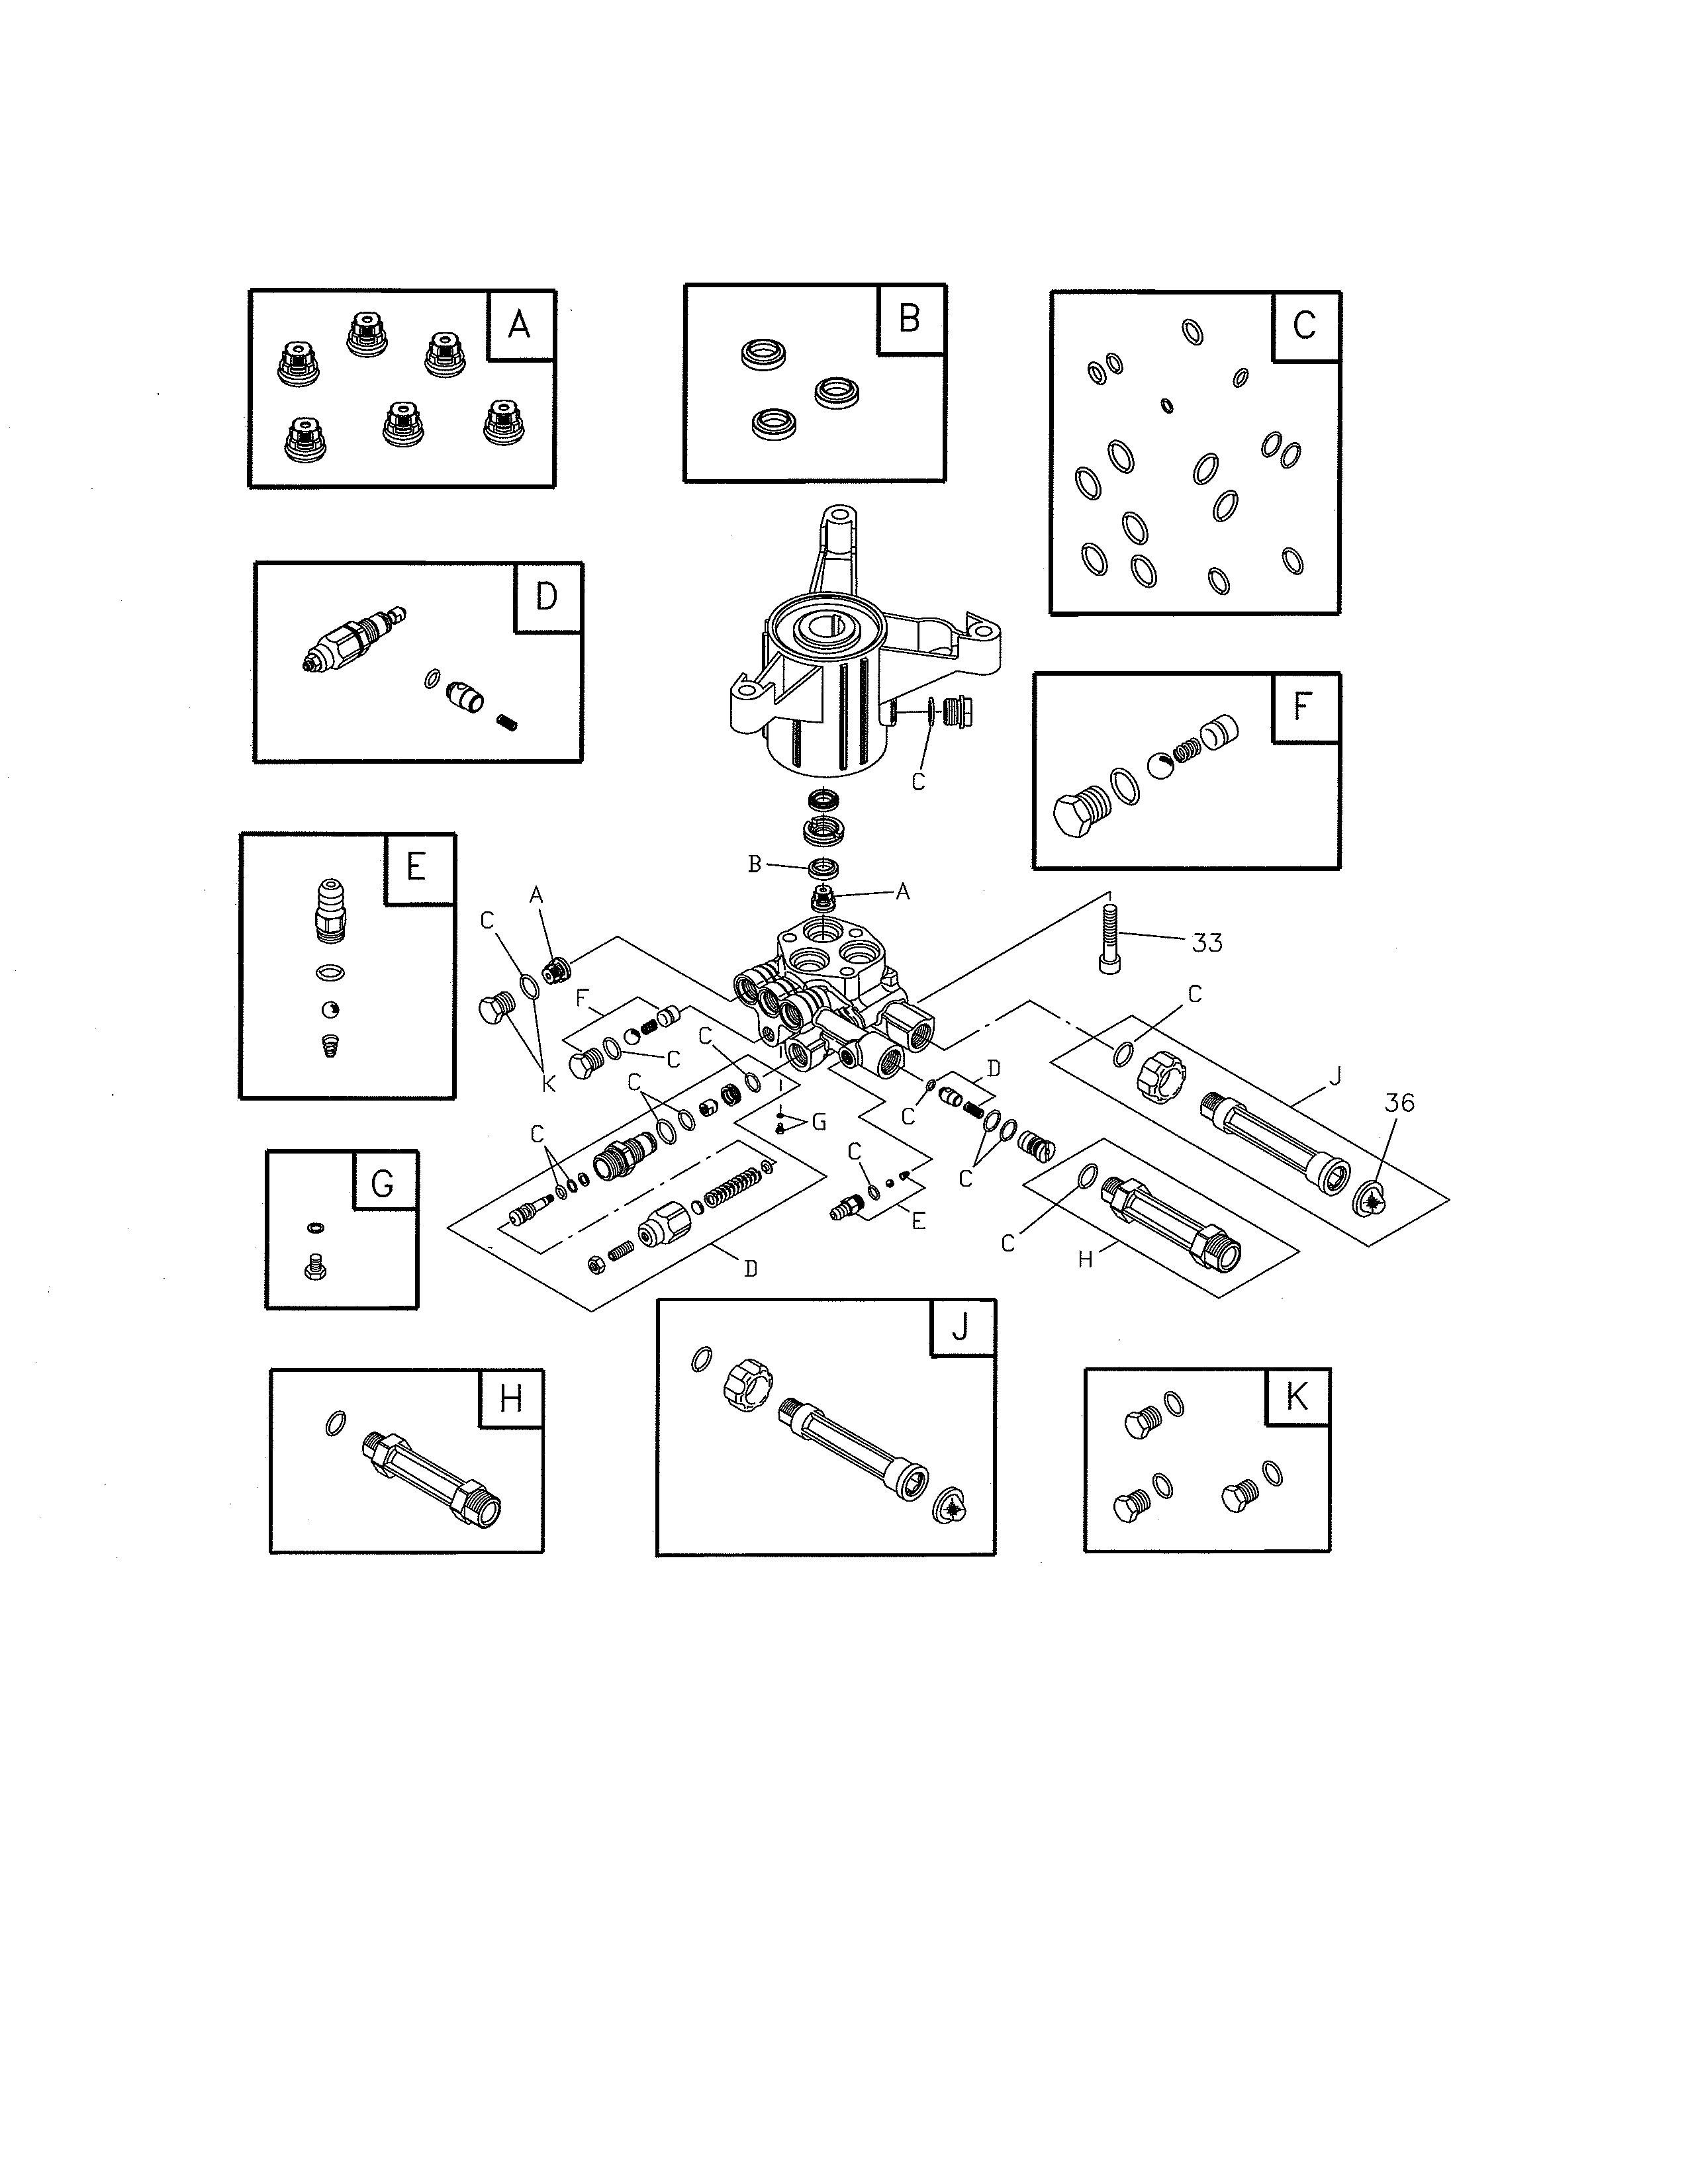 Briggs And Stratton Parts Diagram Engine Fancy 2550x3300